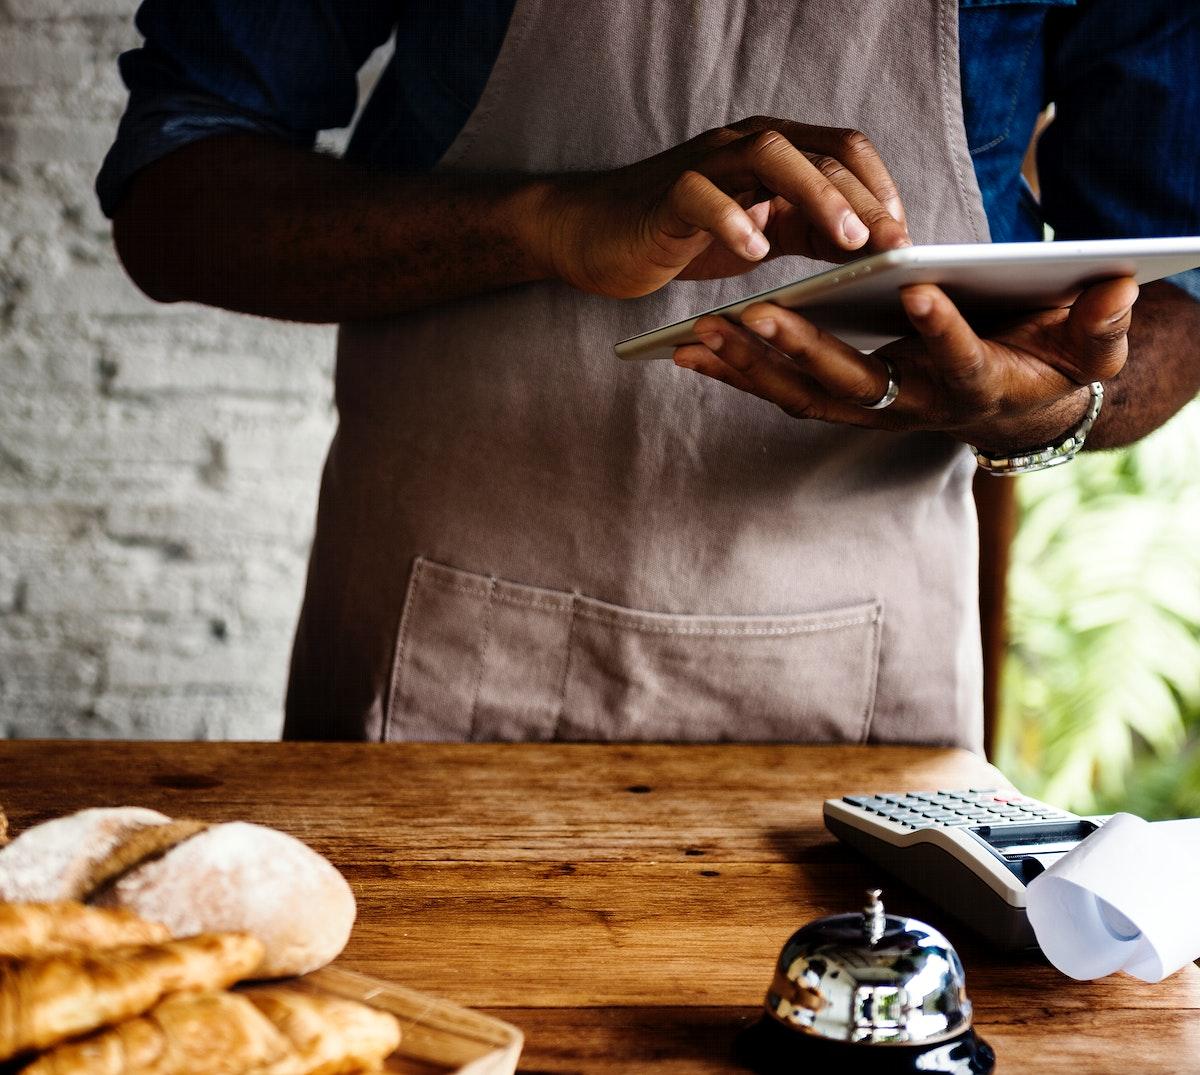 Man using digital tablet in baker's shop